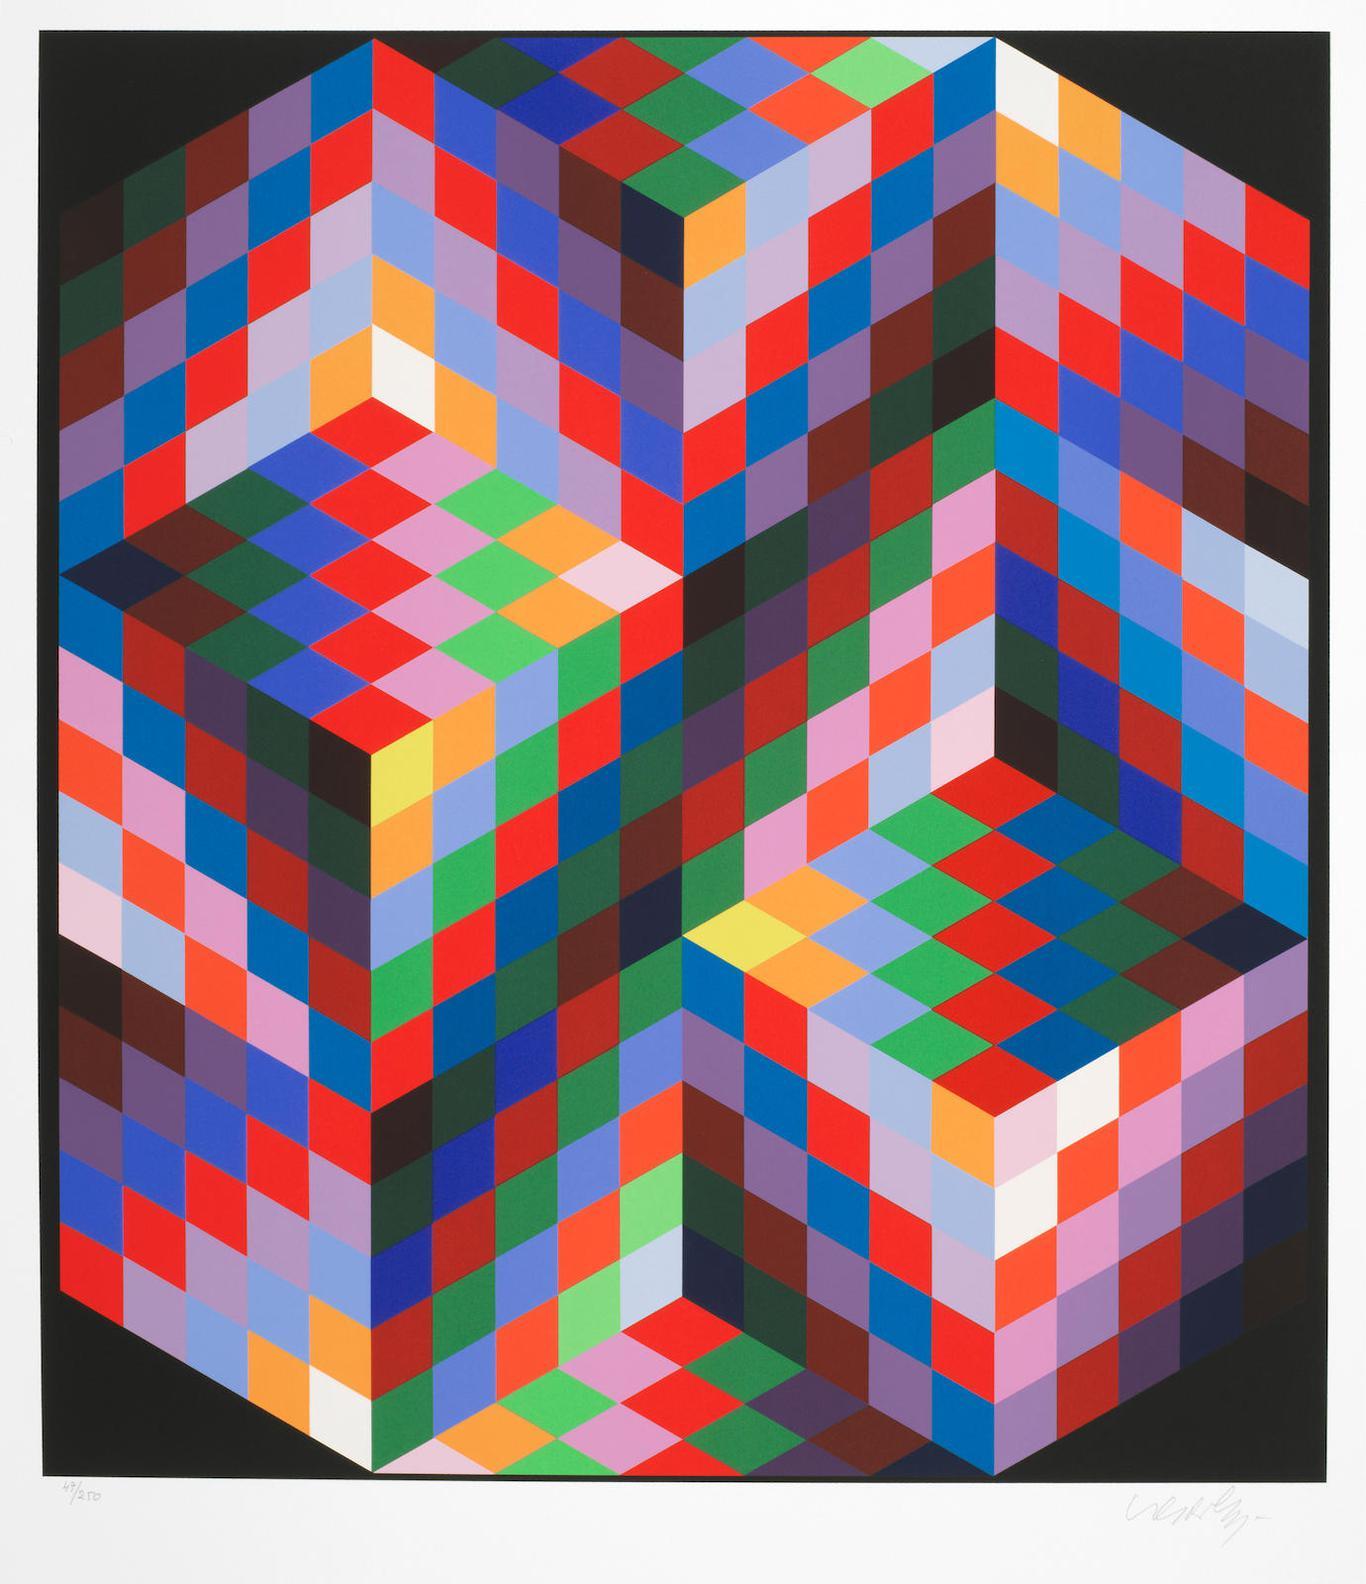 Victor Vasarely-Diam-1988